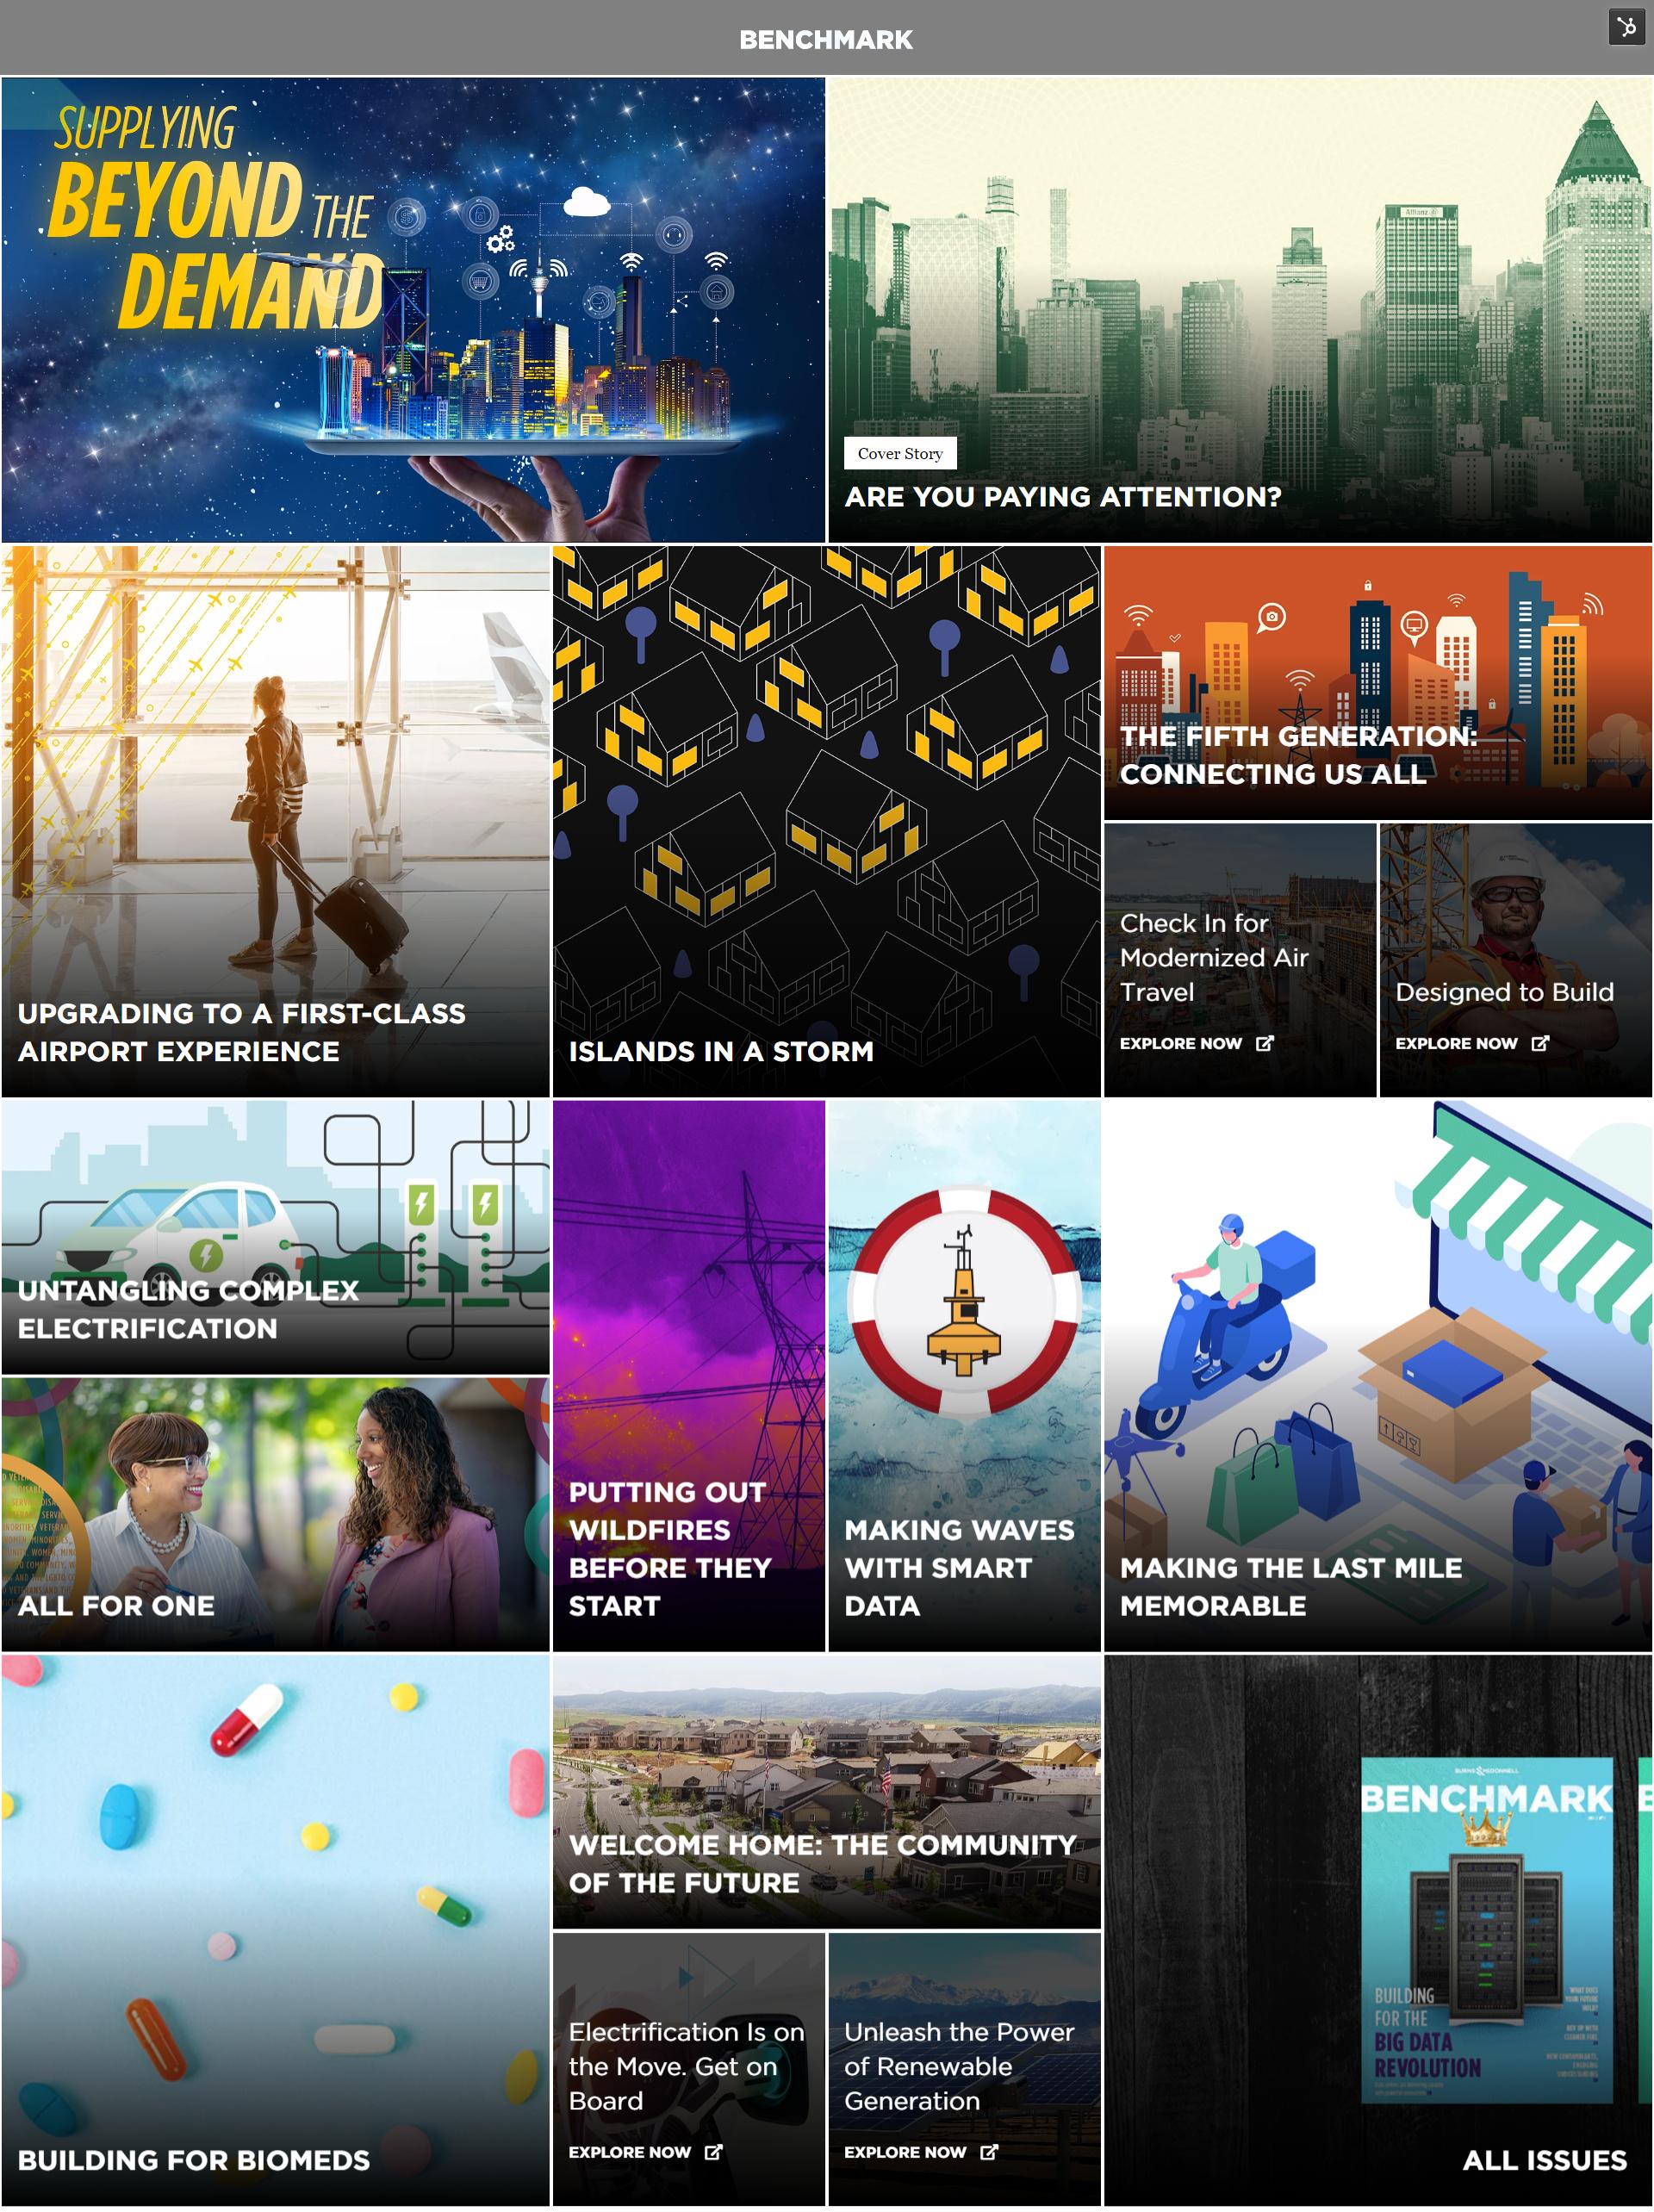 screencapture-info-burnsmcd-benchmark-hub-2019-issue-3-2019-12-13-08_58_44